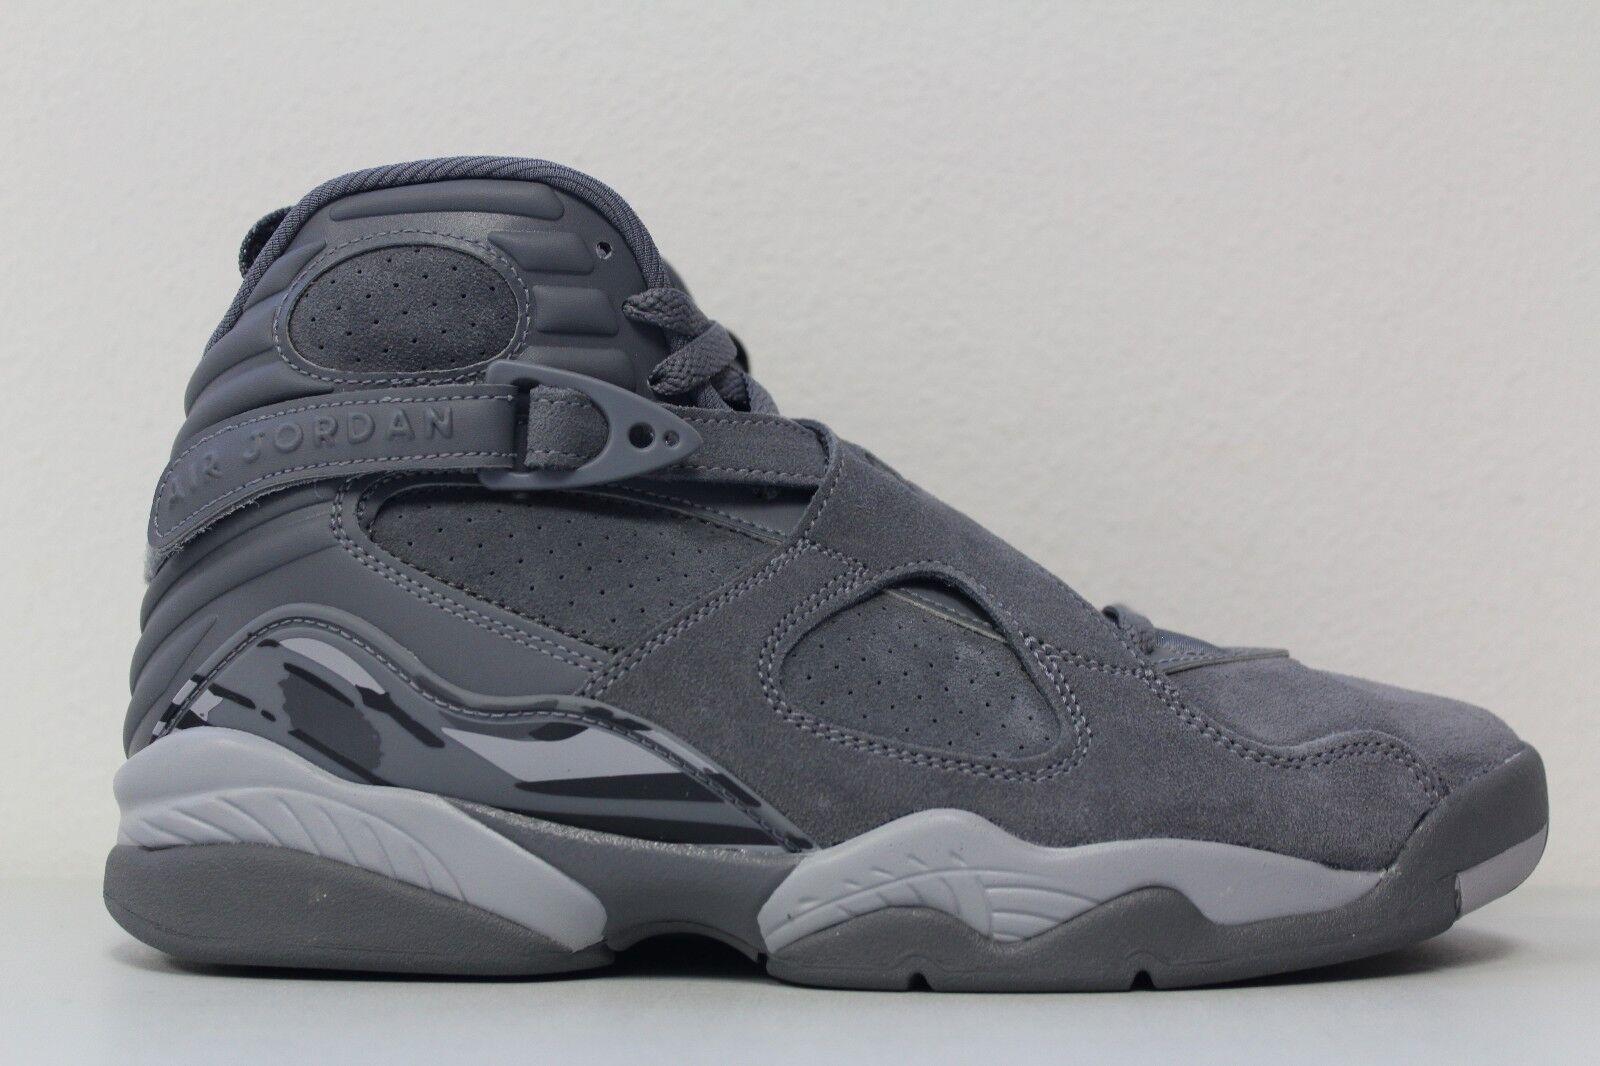 Nike air jordan 8 viii Uomo retrò taglia 10 cool grey wolf 305381-014 camoscio